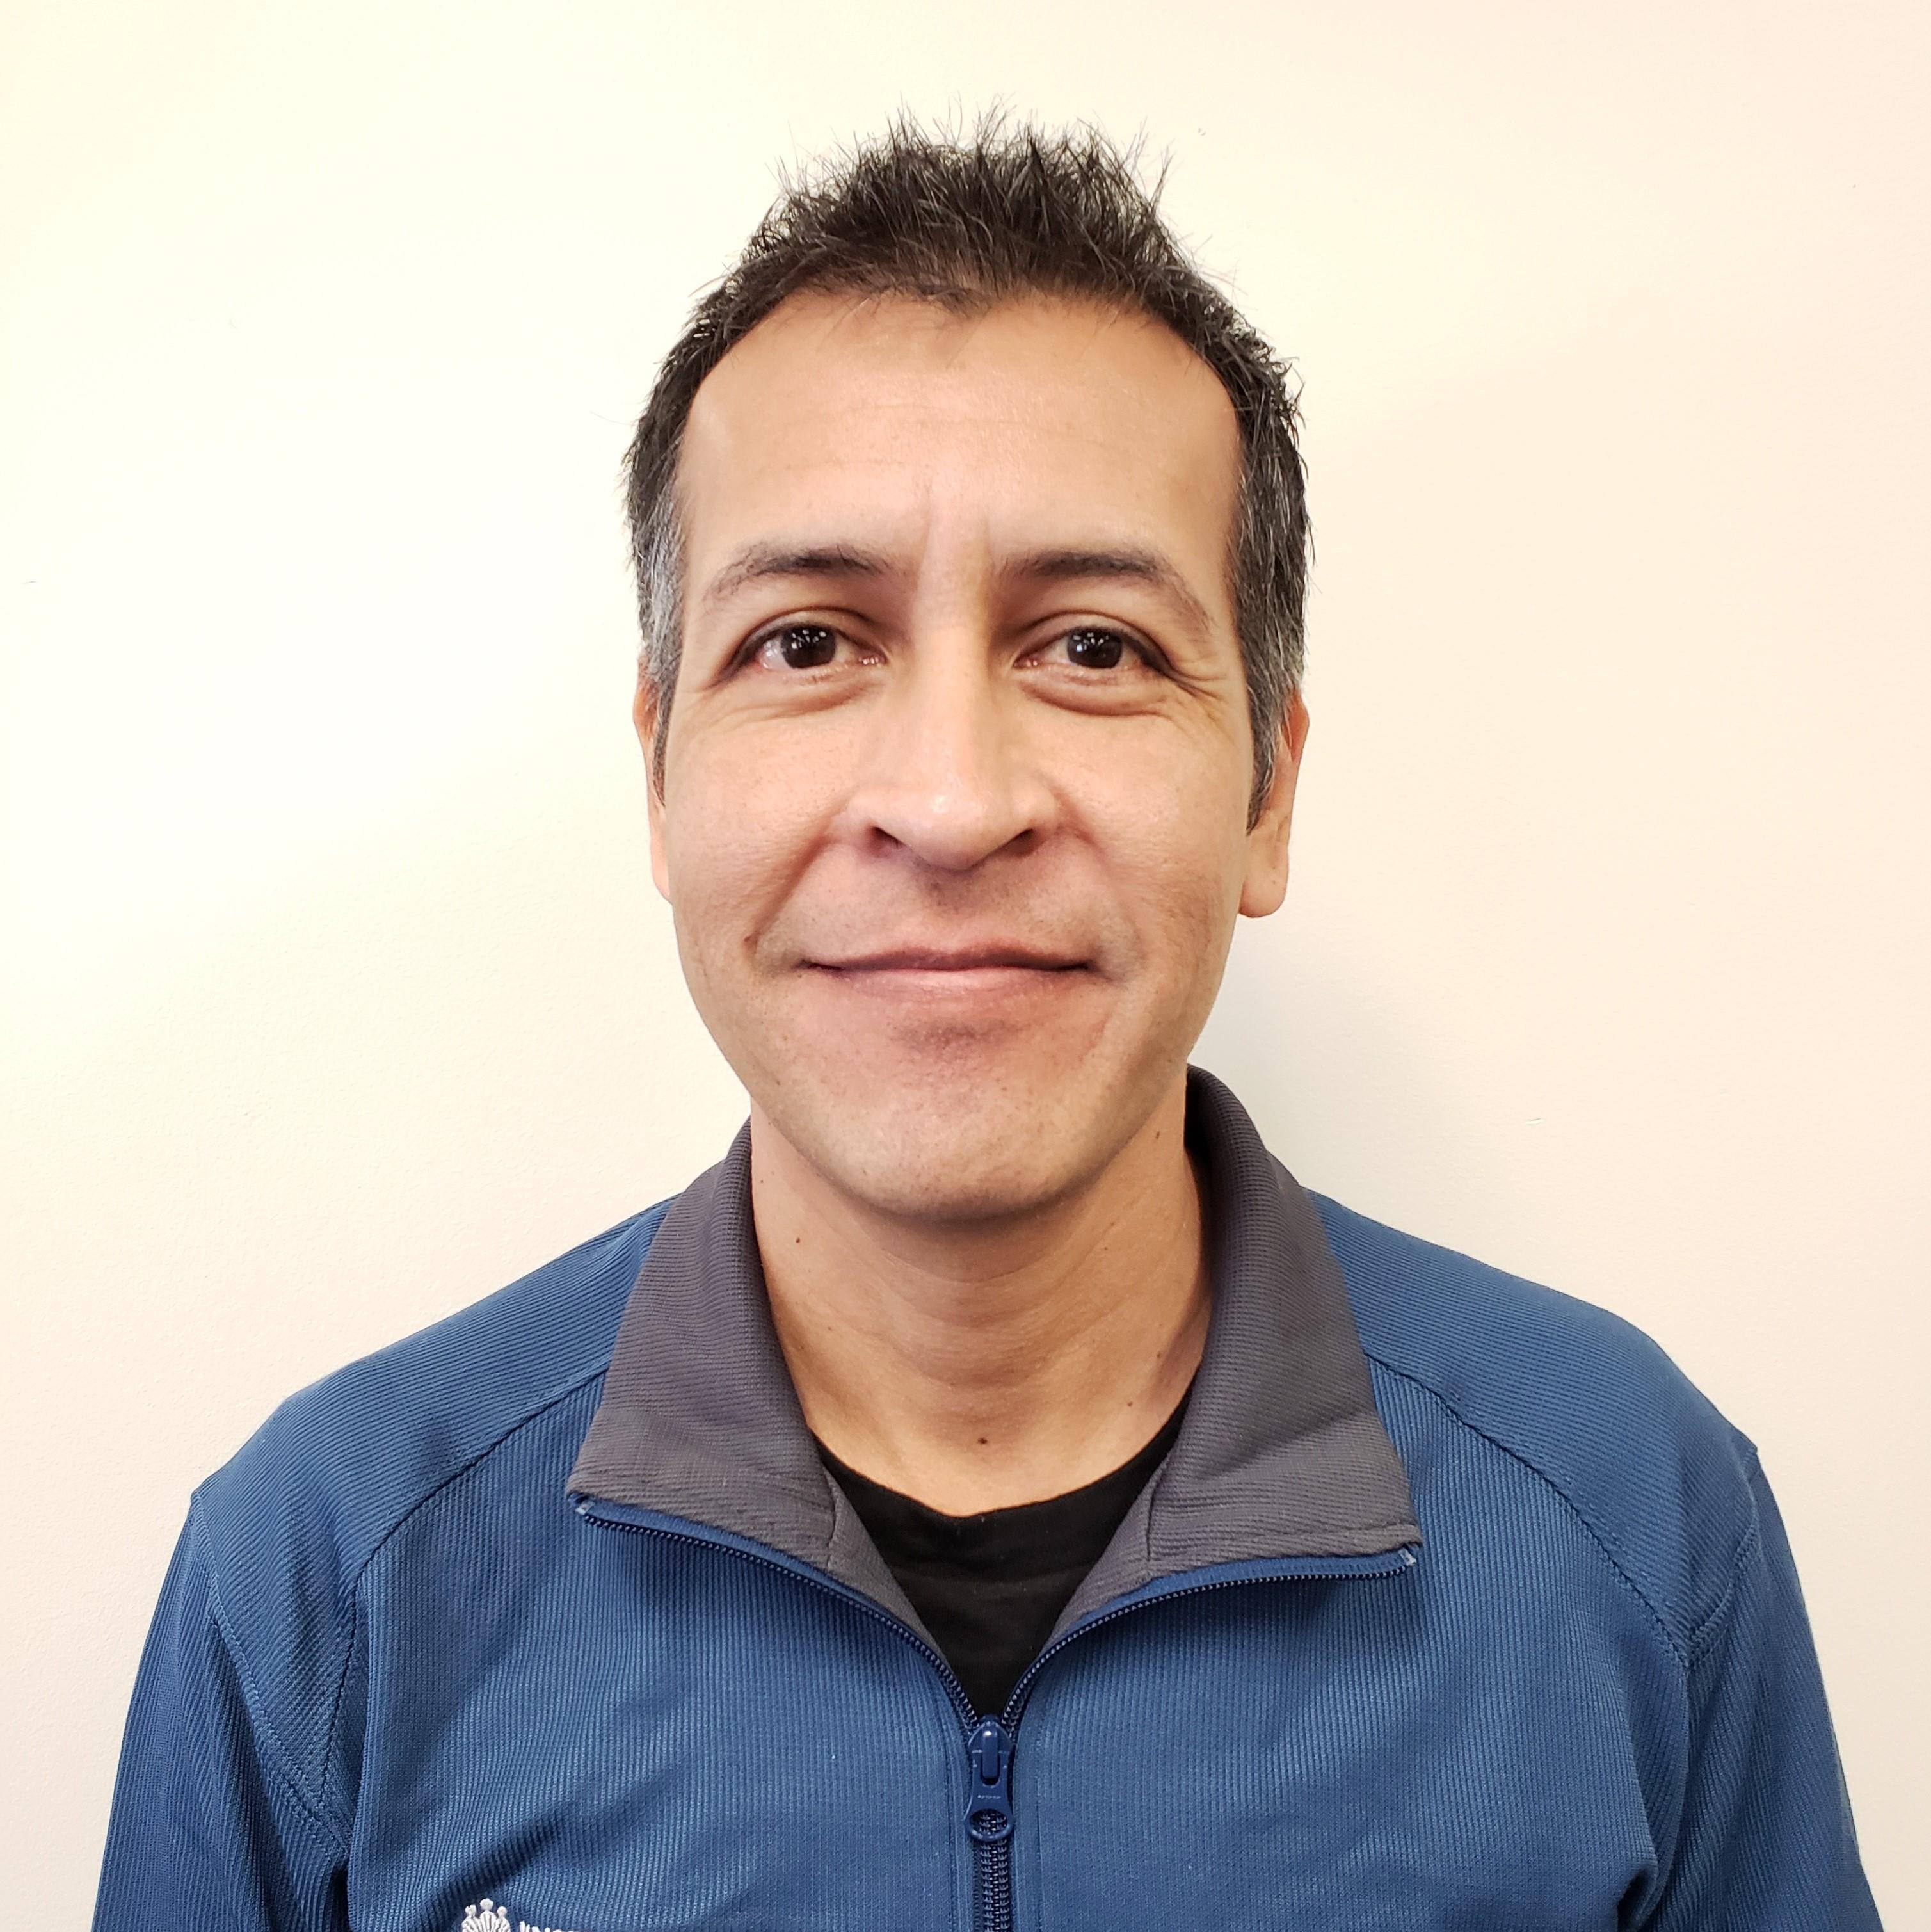 Jose Banuelos